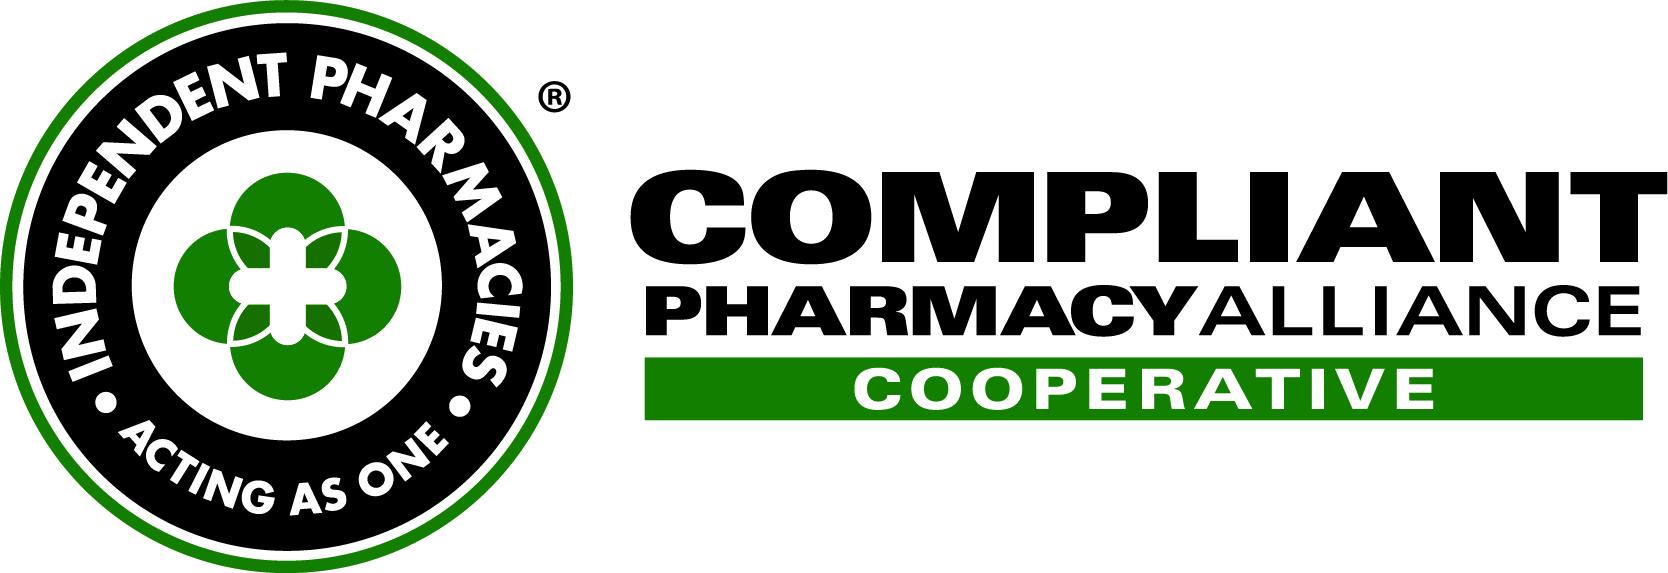 2021_ComputerTalk_Buyers_Guide_Compliant_Pharmacy_Alliance_logo